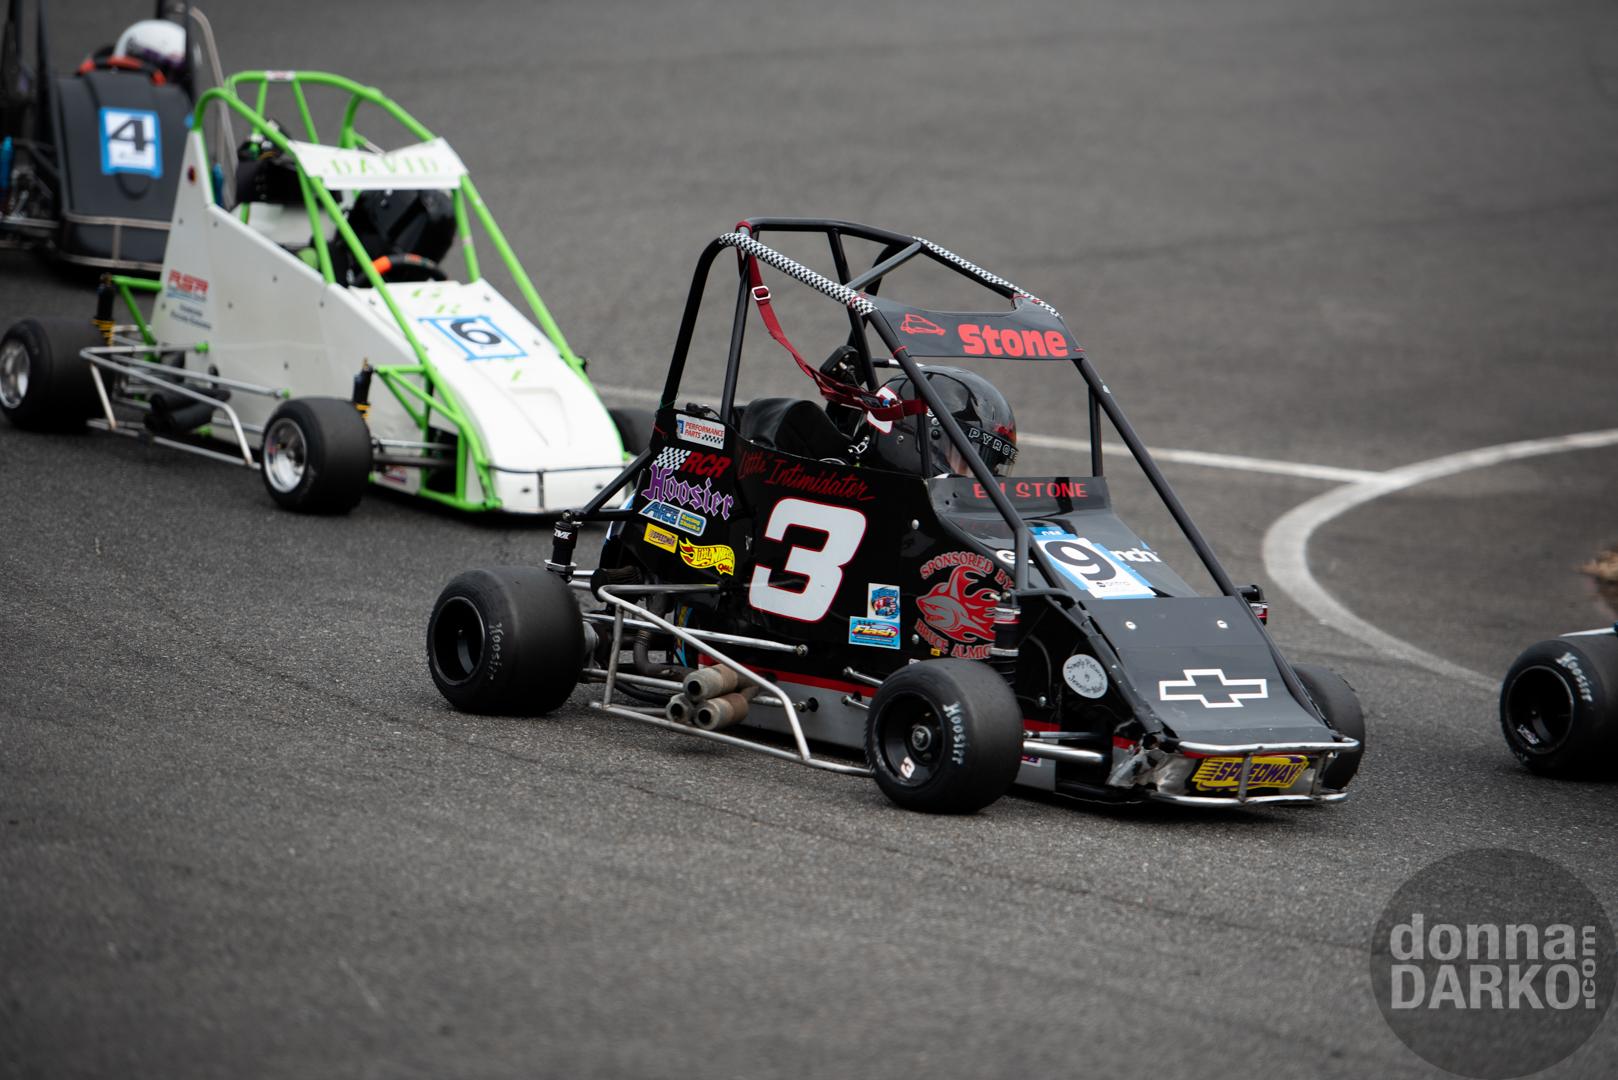 QWMA (Racing) 8-11-2019 DSC_7170.jpg